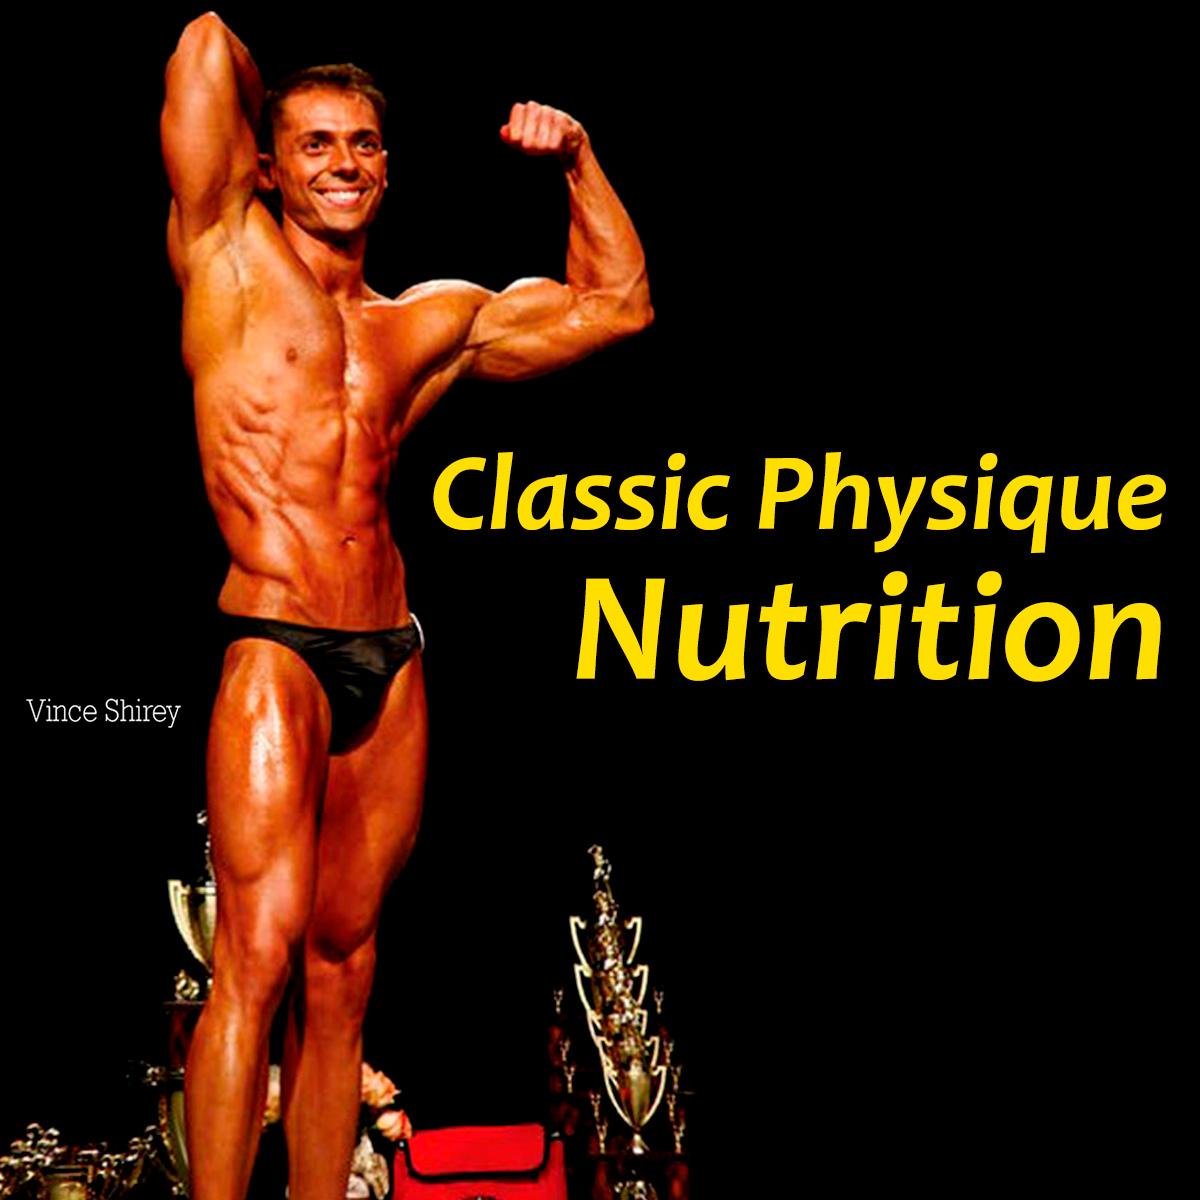 Classic Physique - Nutrition